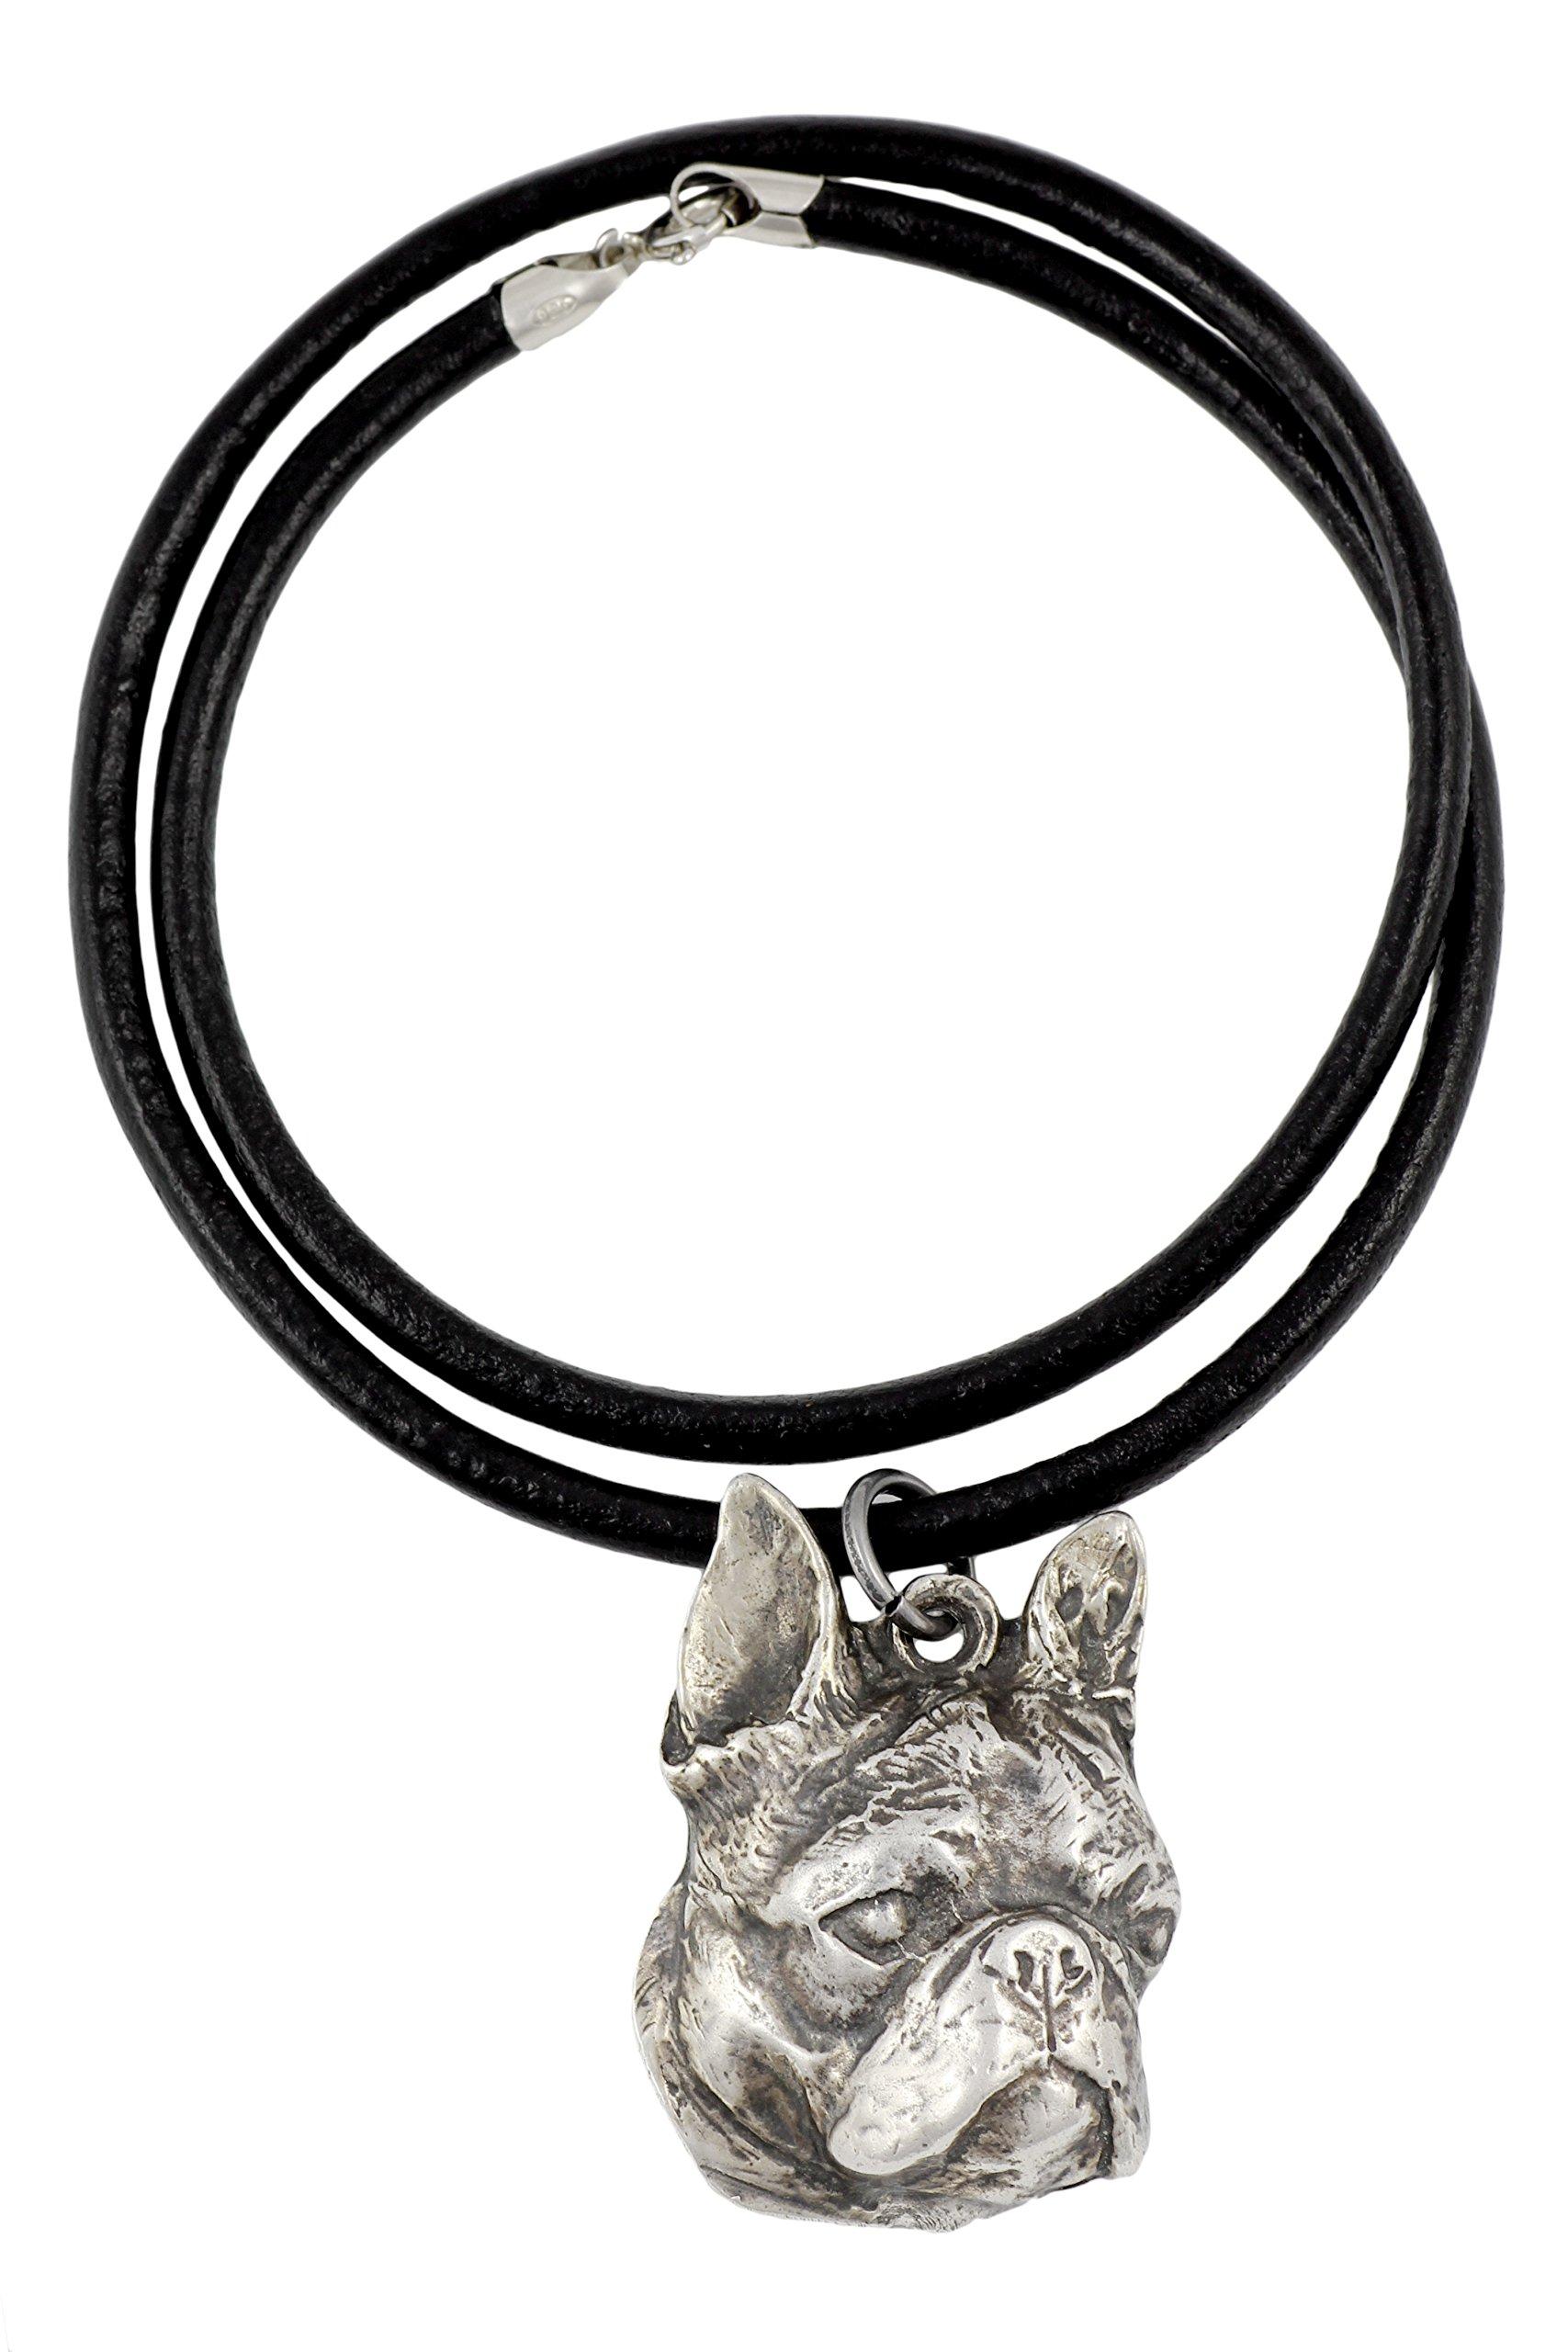 Boston Terrier, Boston Bull, American Gentlemen, Silver Hallmark 925, Dog Silver Necklaces, Limited Edition, Artdog